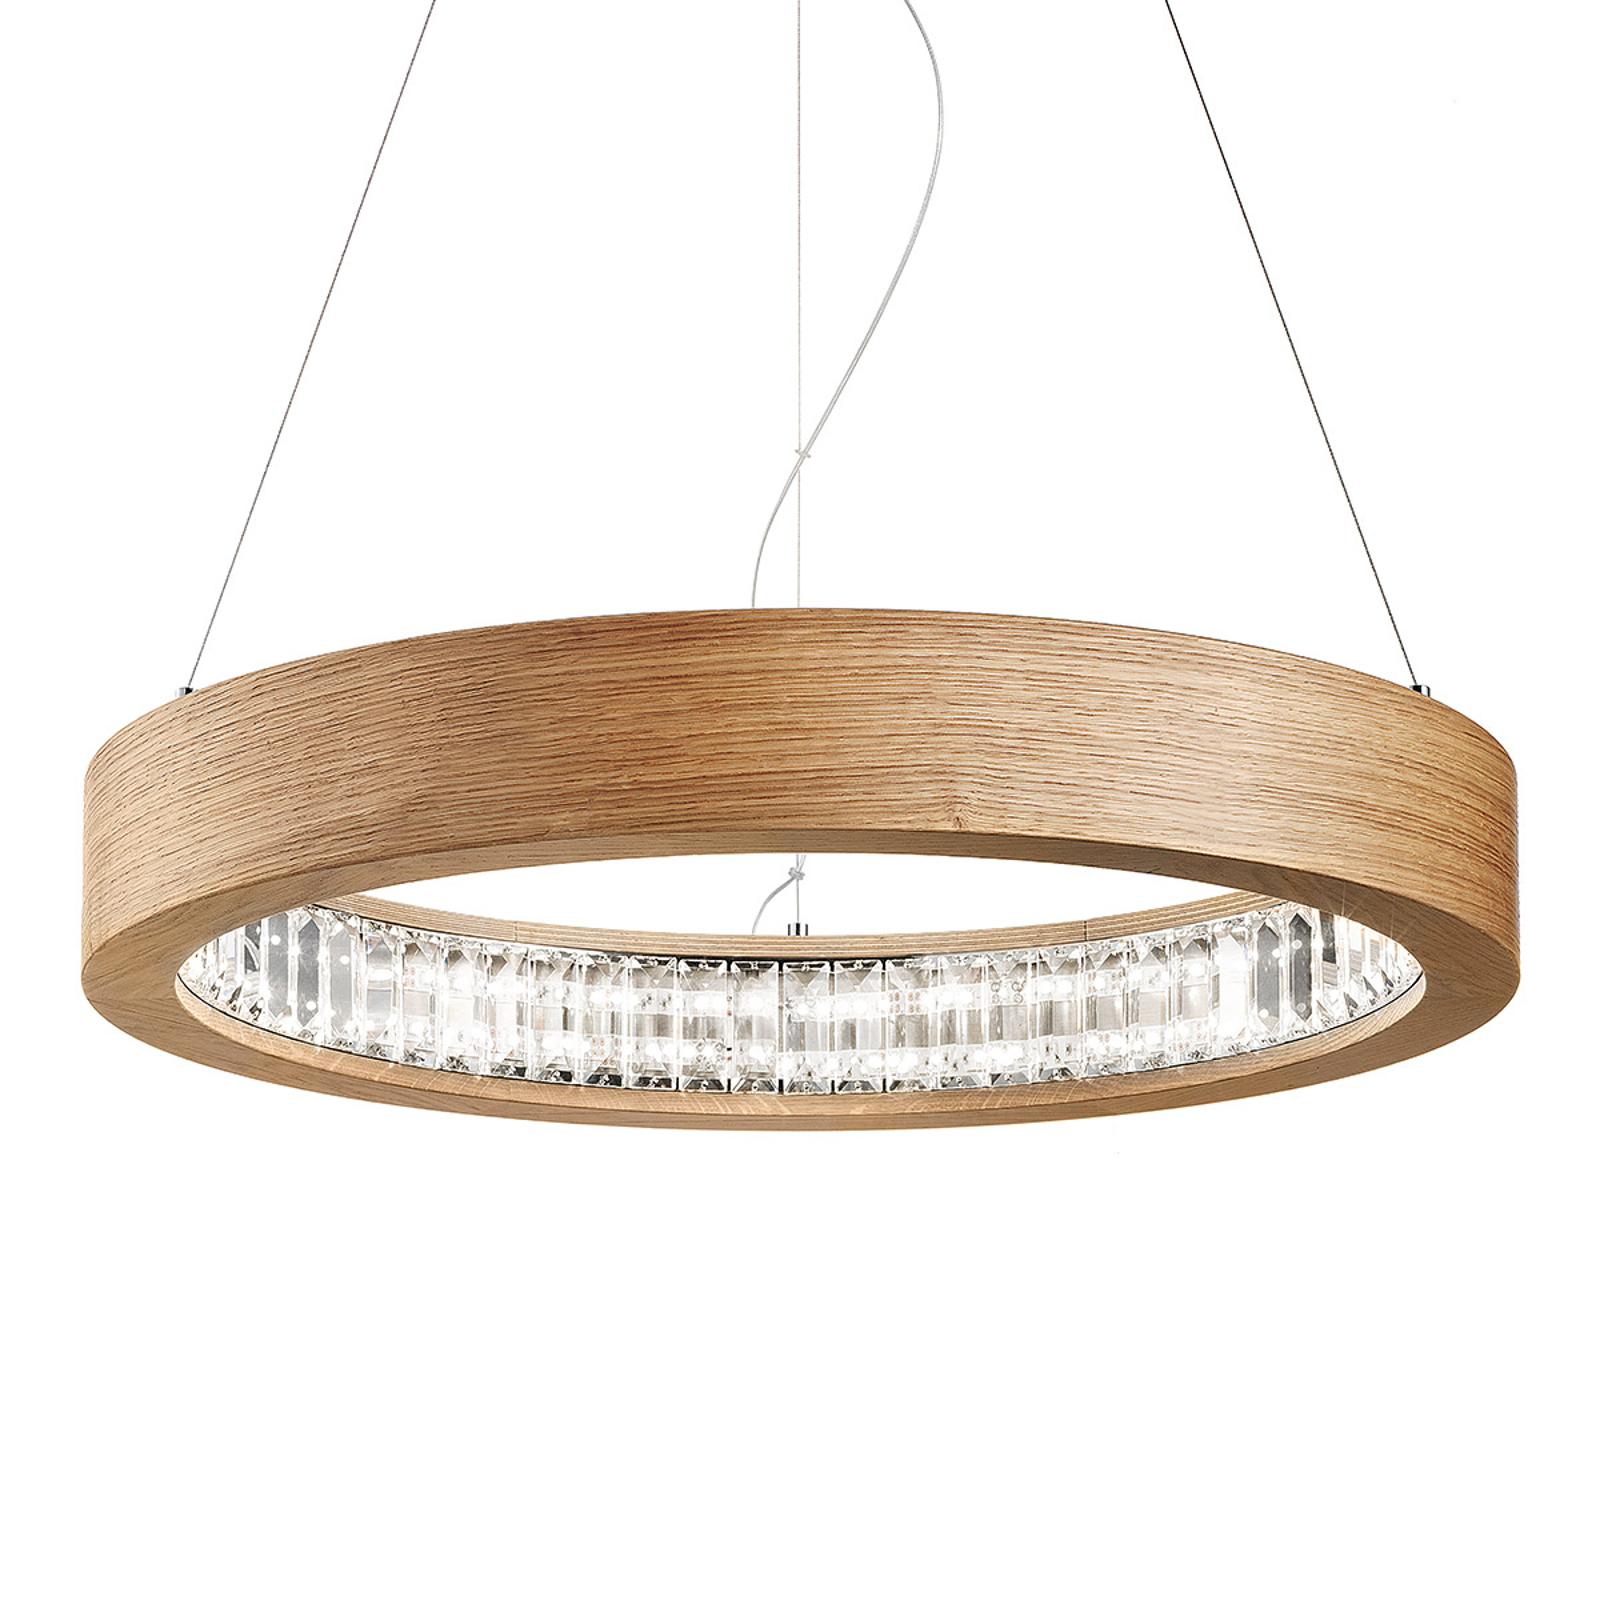 Suspension LED ronde Libe Round, 60 cm